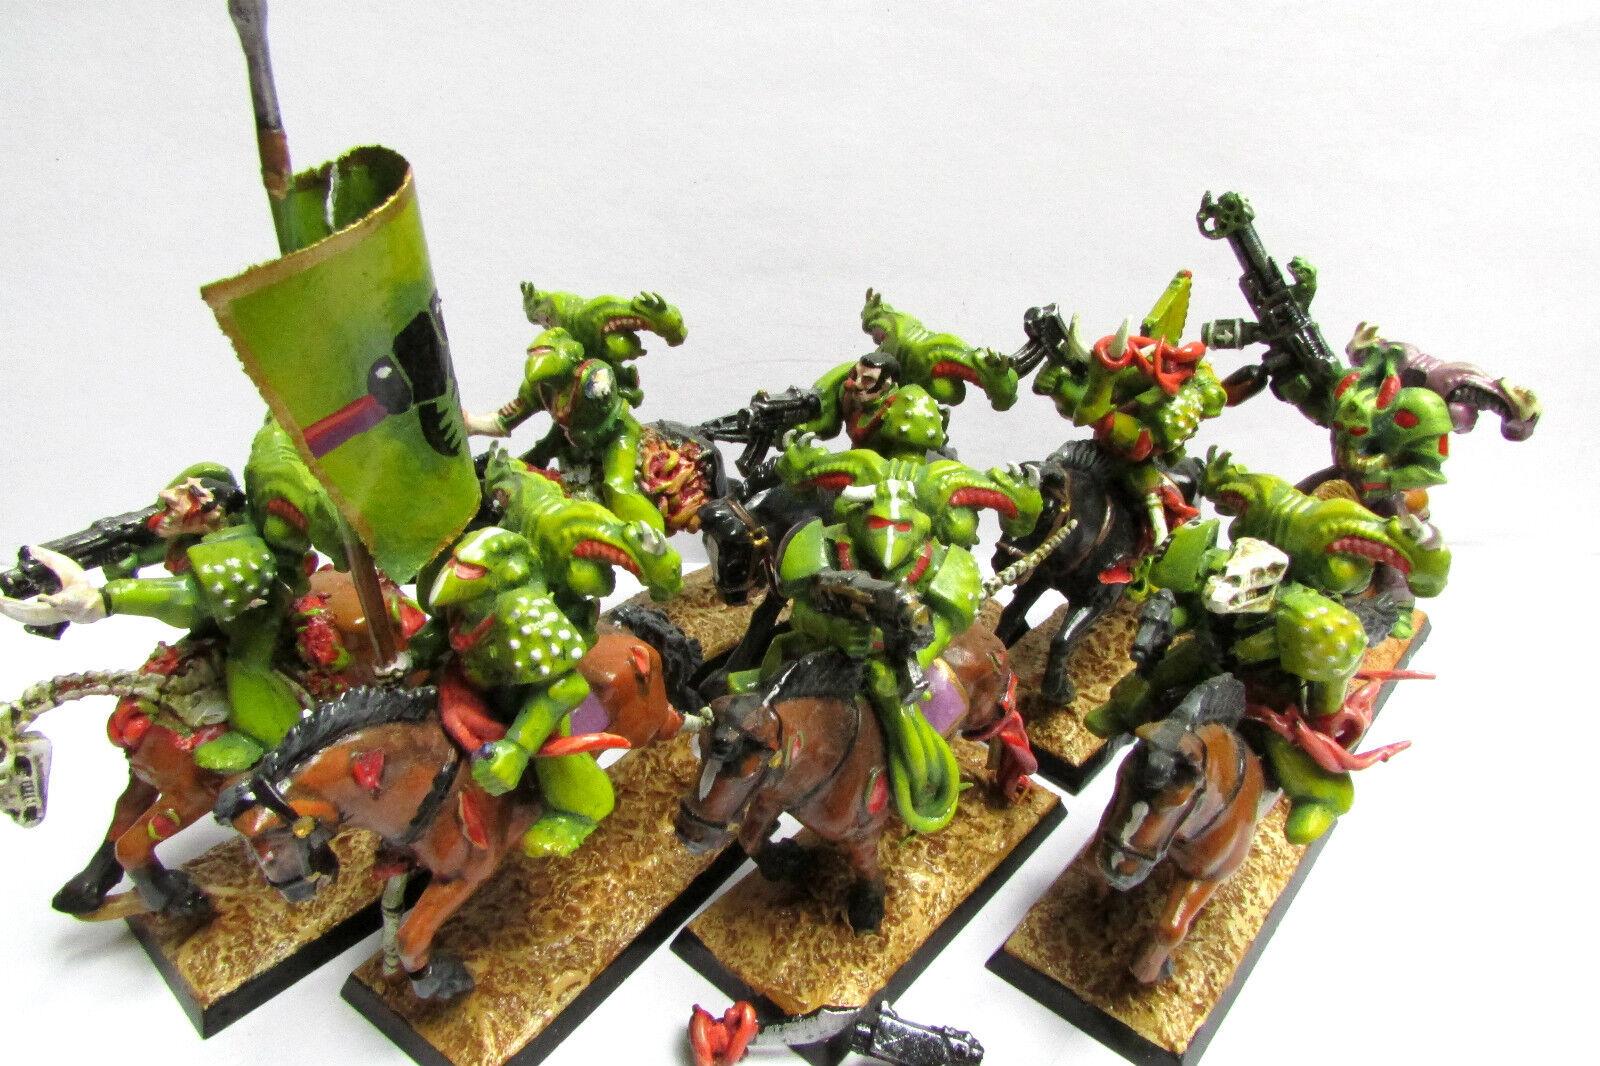 Épuisé warhammer 40k ROGUE TRADER RTB01 Nurgle Chaos Space Marines Cavalerie